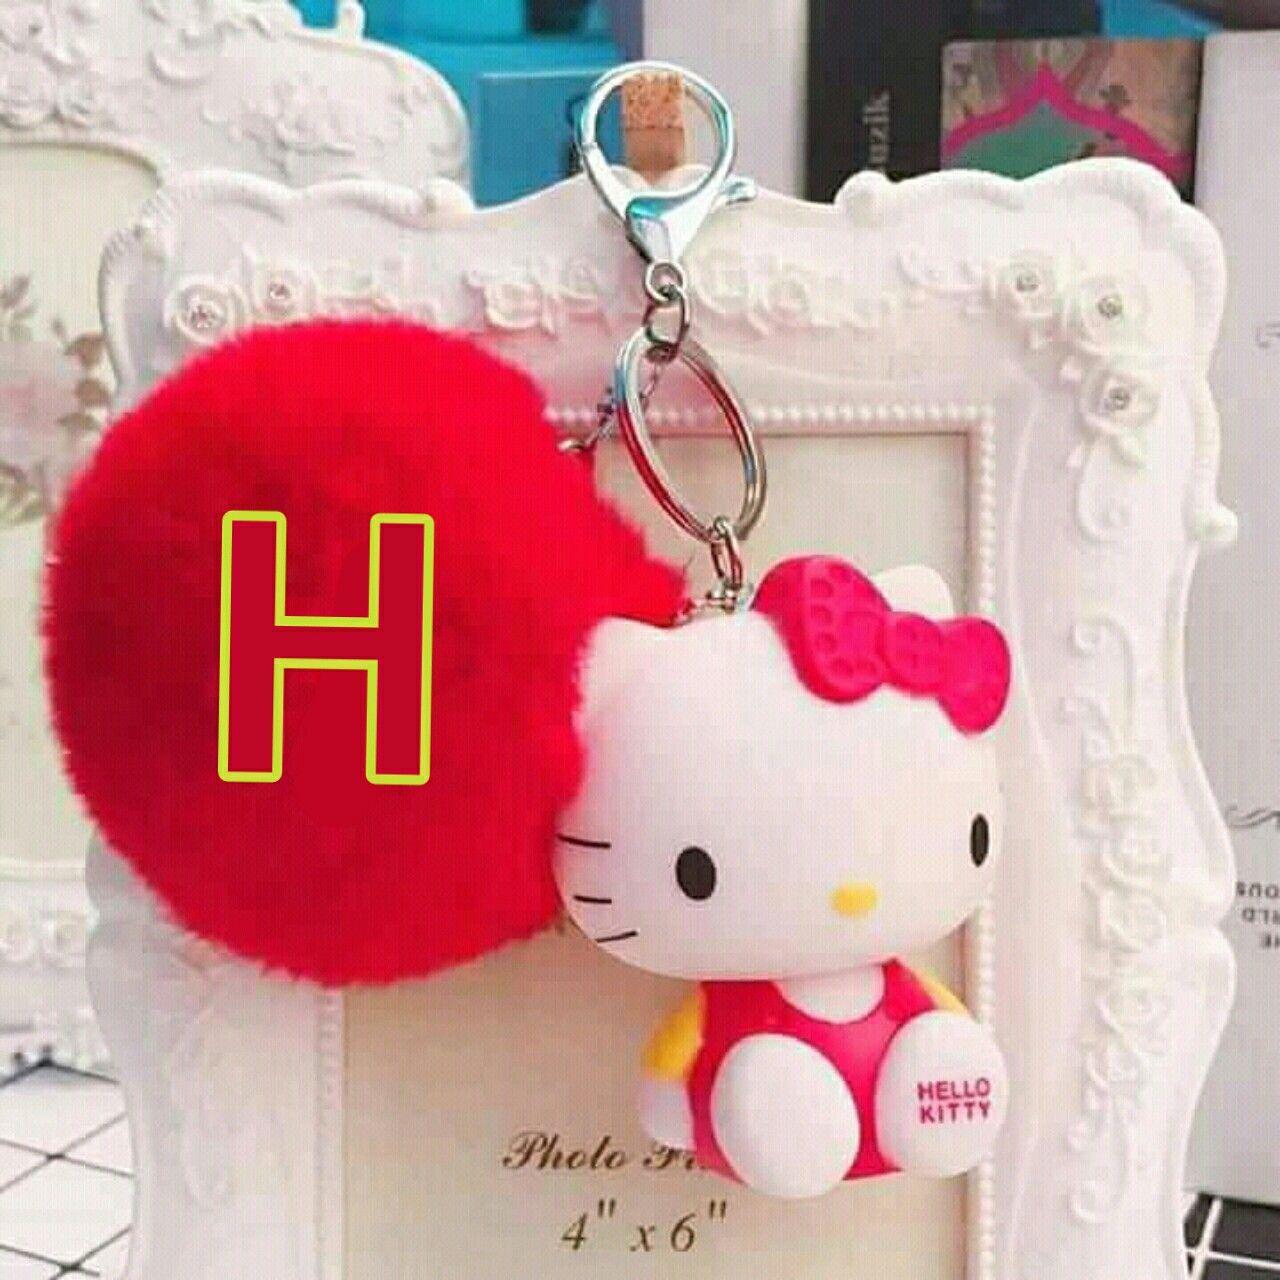 Pin By Qaisar Rafique On Dp S Names Pics Hello Kitty Keychain Hello Kitty Photos Hello Kitty